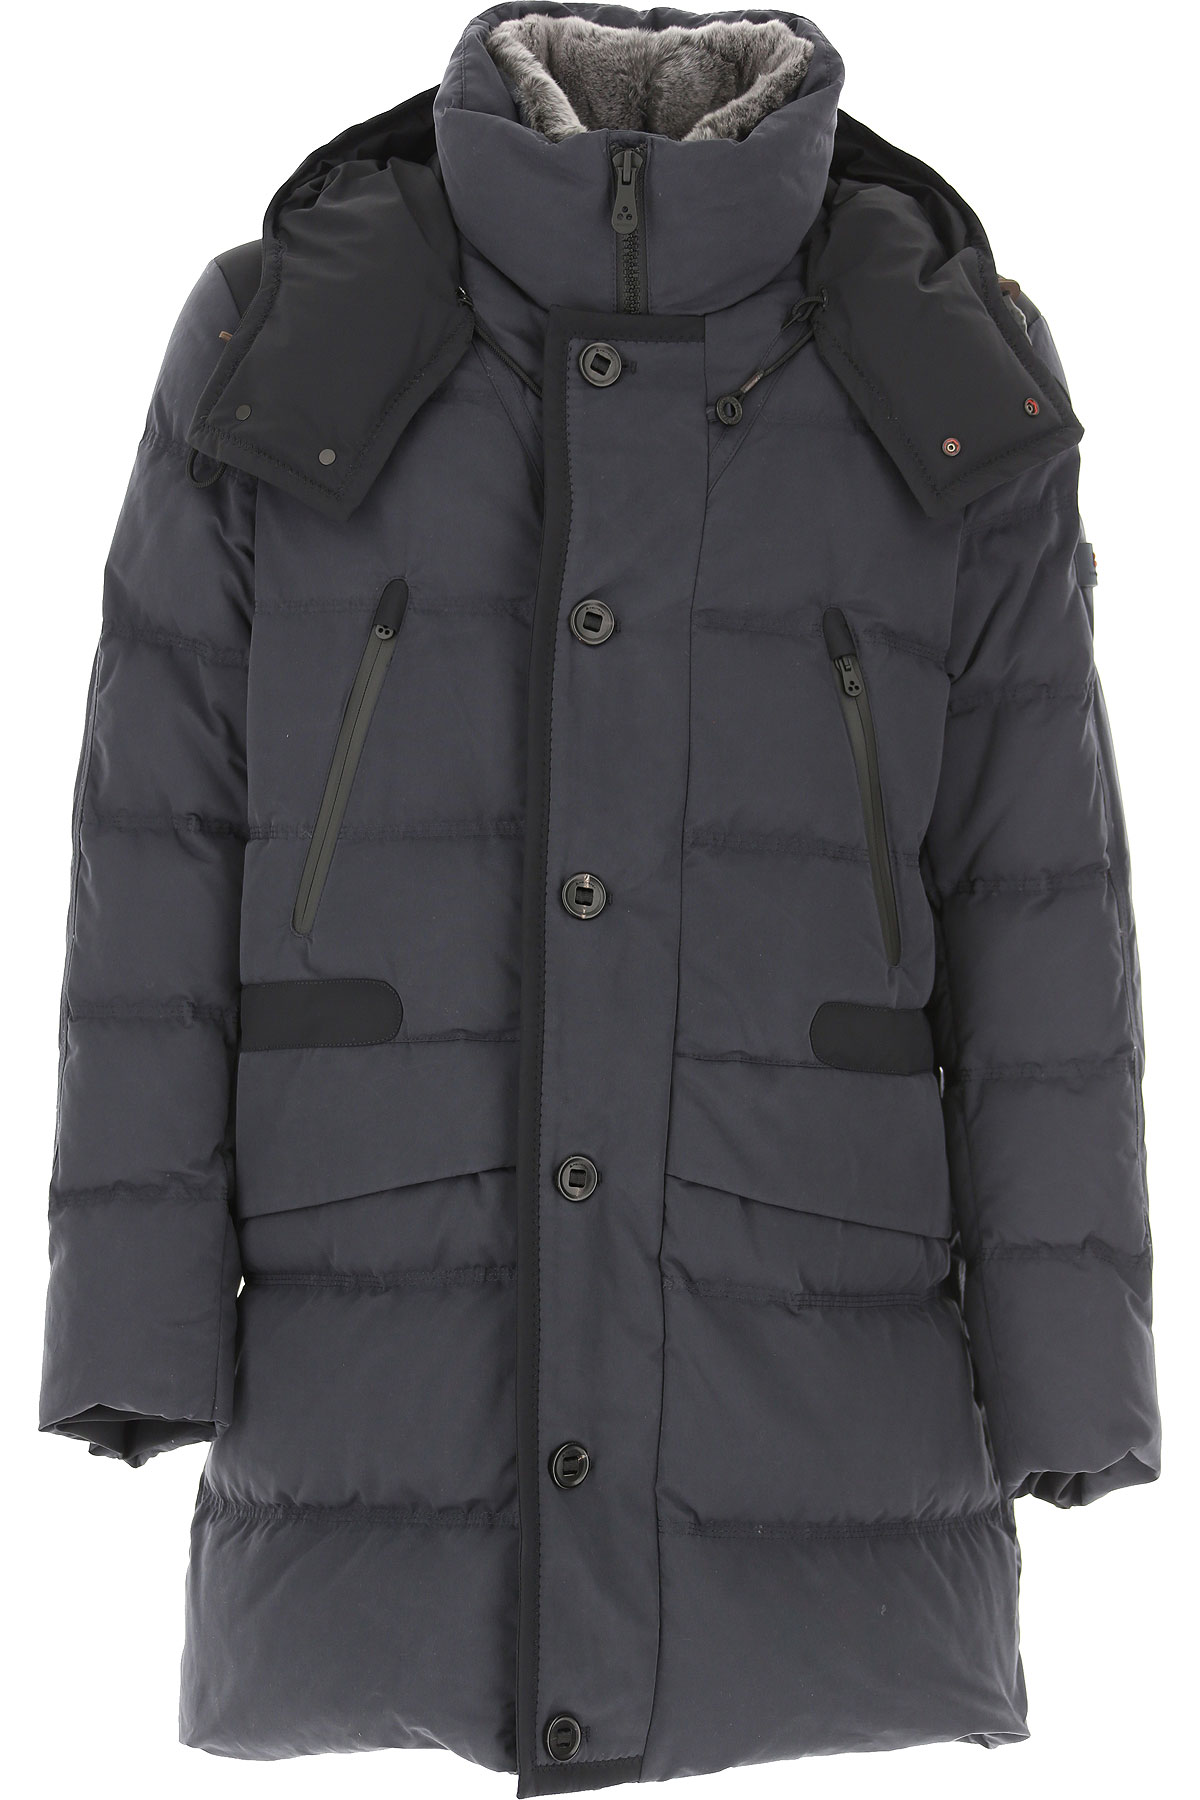 Peuterey Down Jacket for Men, Puffer Ski Jacket On Sale, Dark Navy Blue, Down, 2019, L S